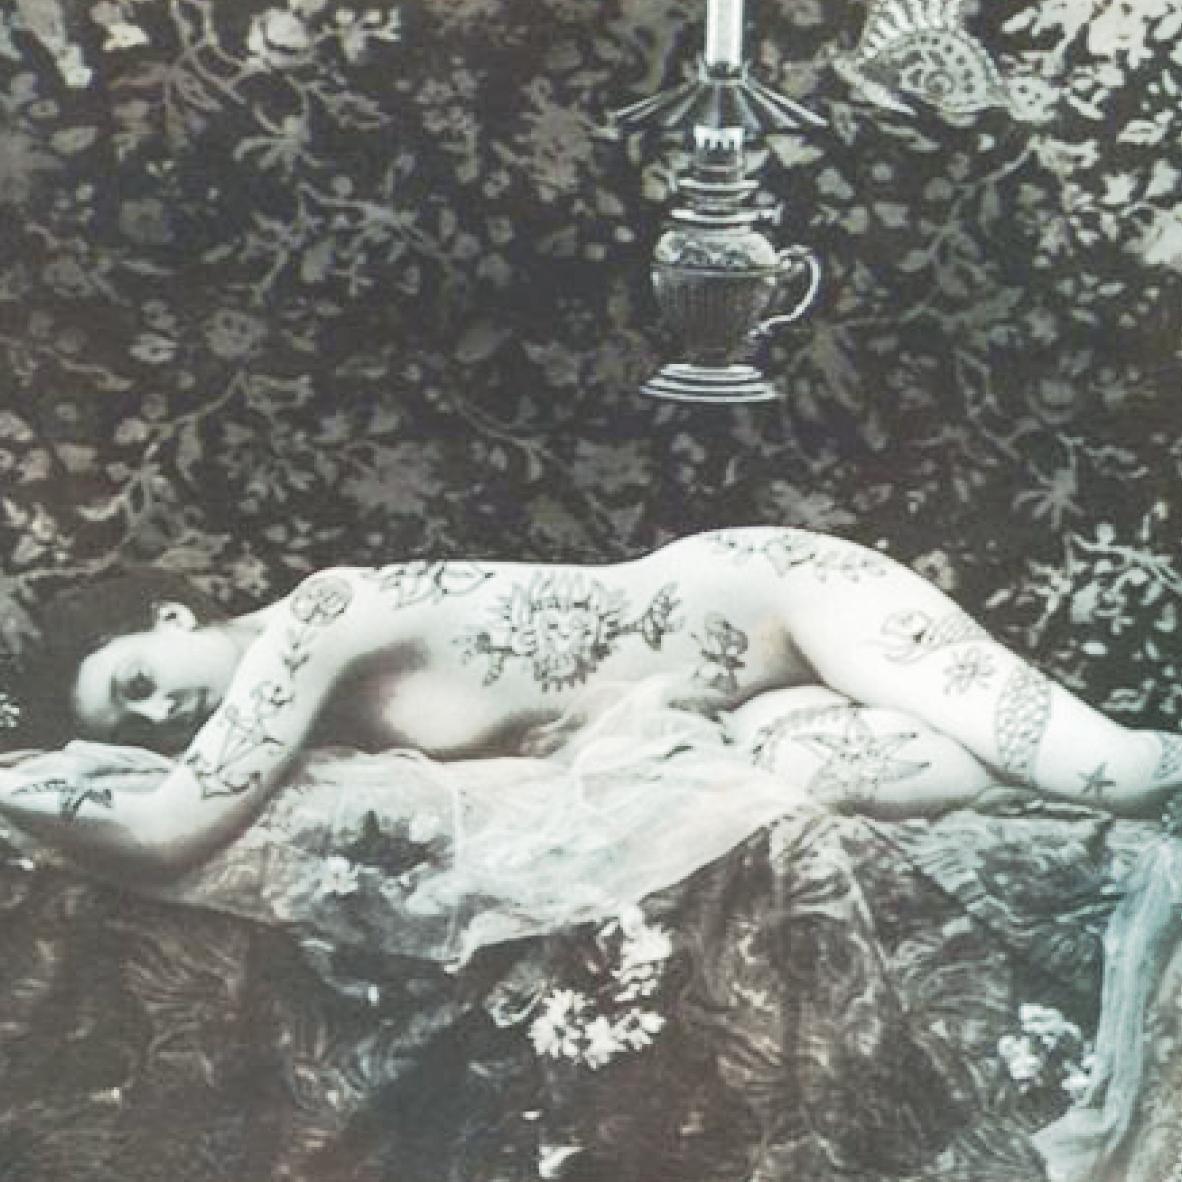 XSS124  |  Cubo  |  Garden  of  Love